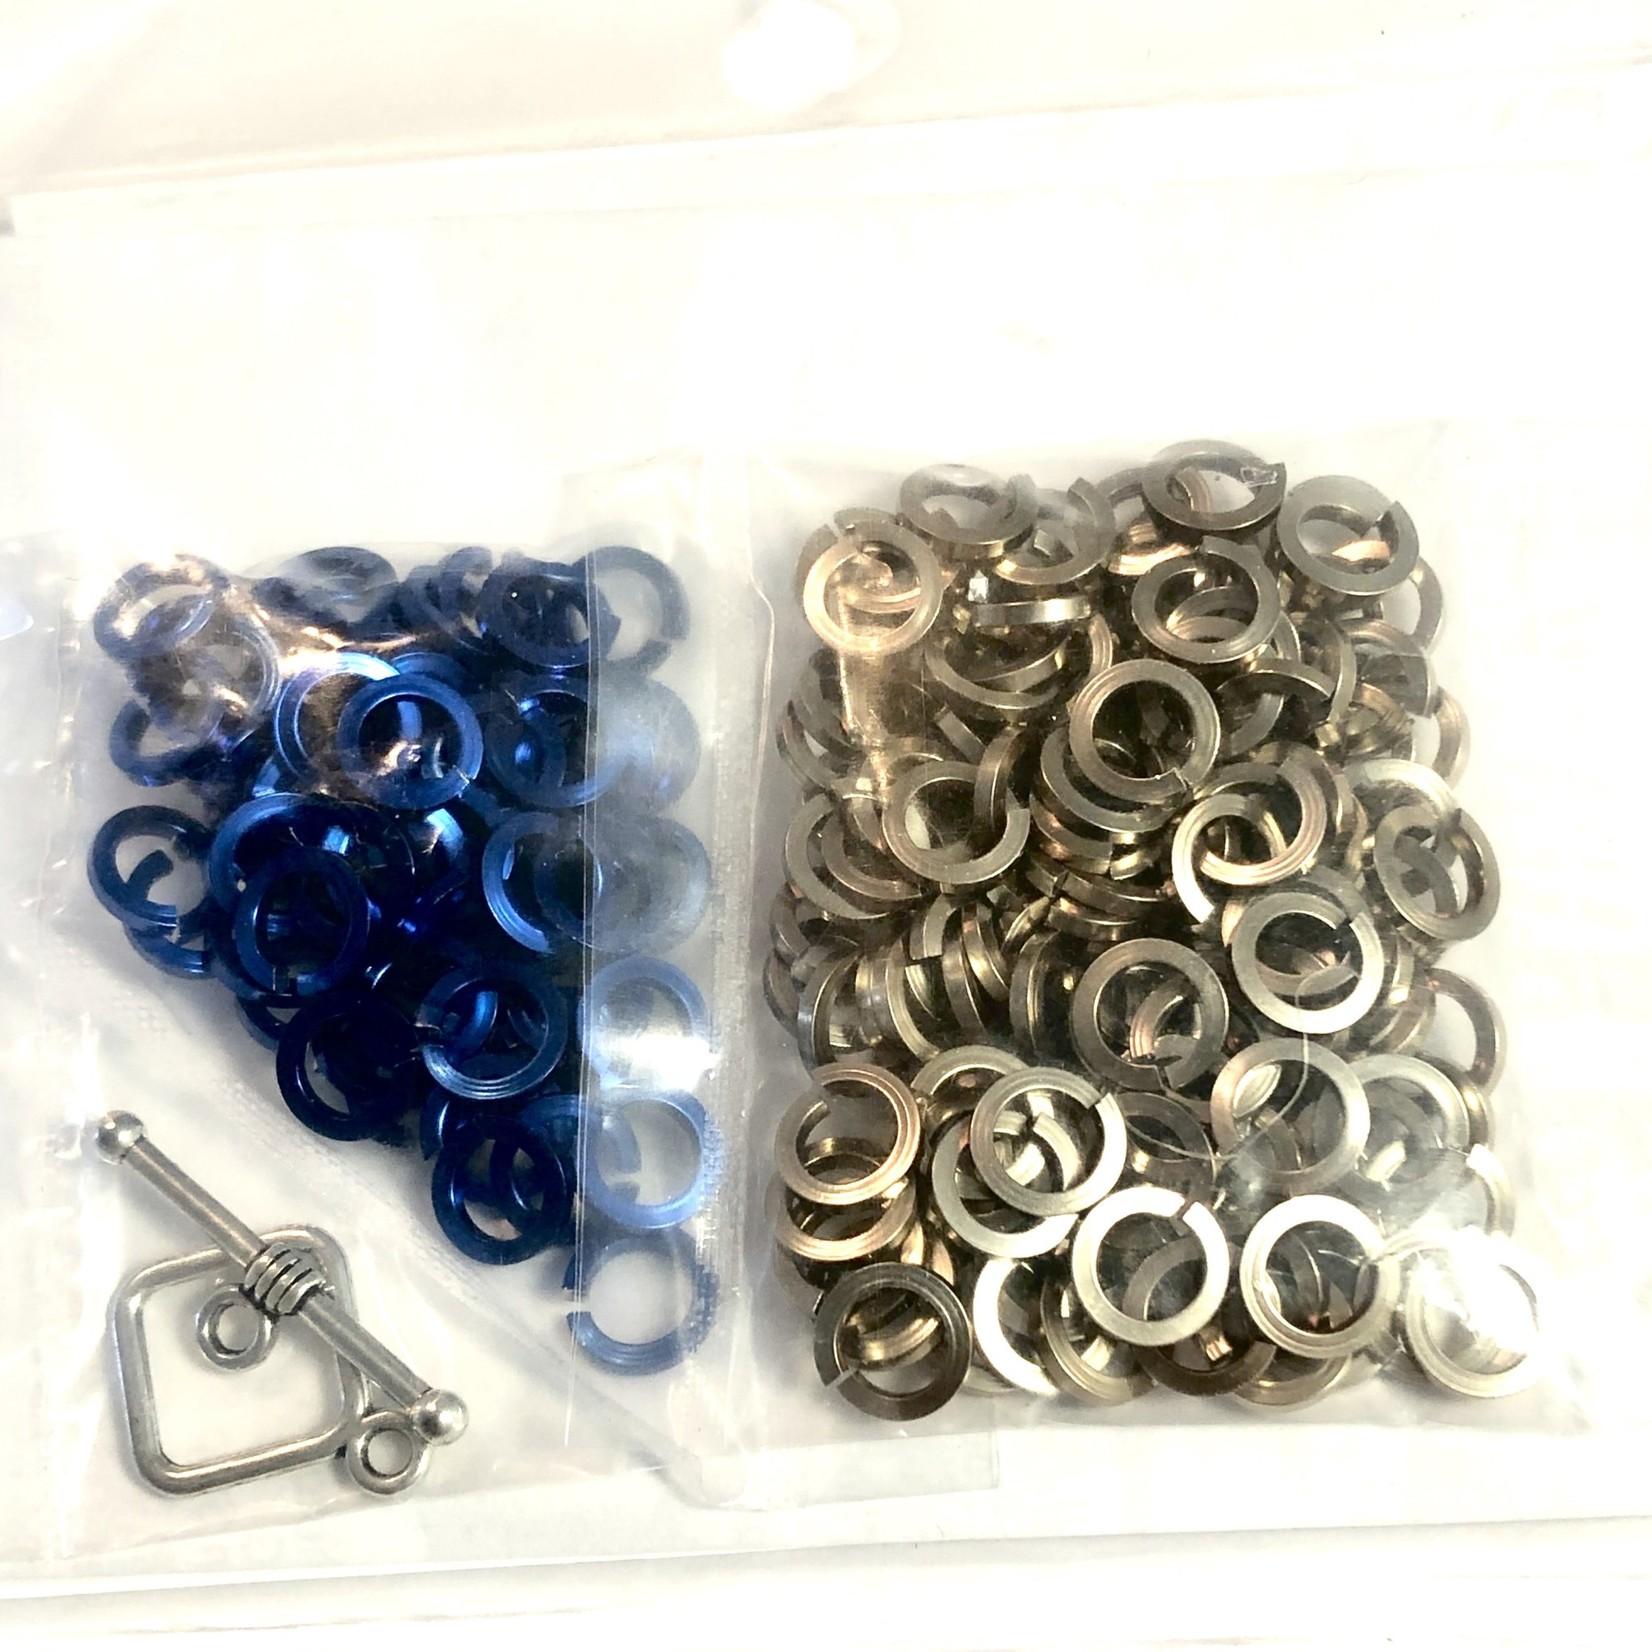 Hyperlinks Chain Maille Sq Byzantine Bracelet Kit Royal Blue & Champagne